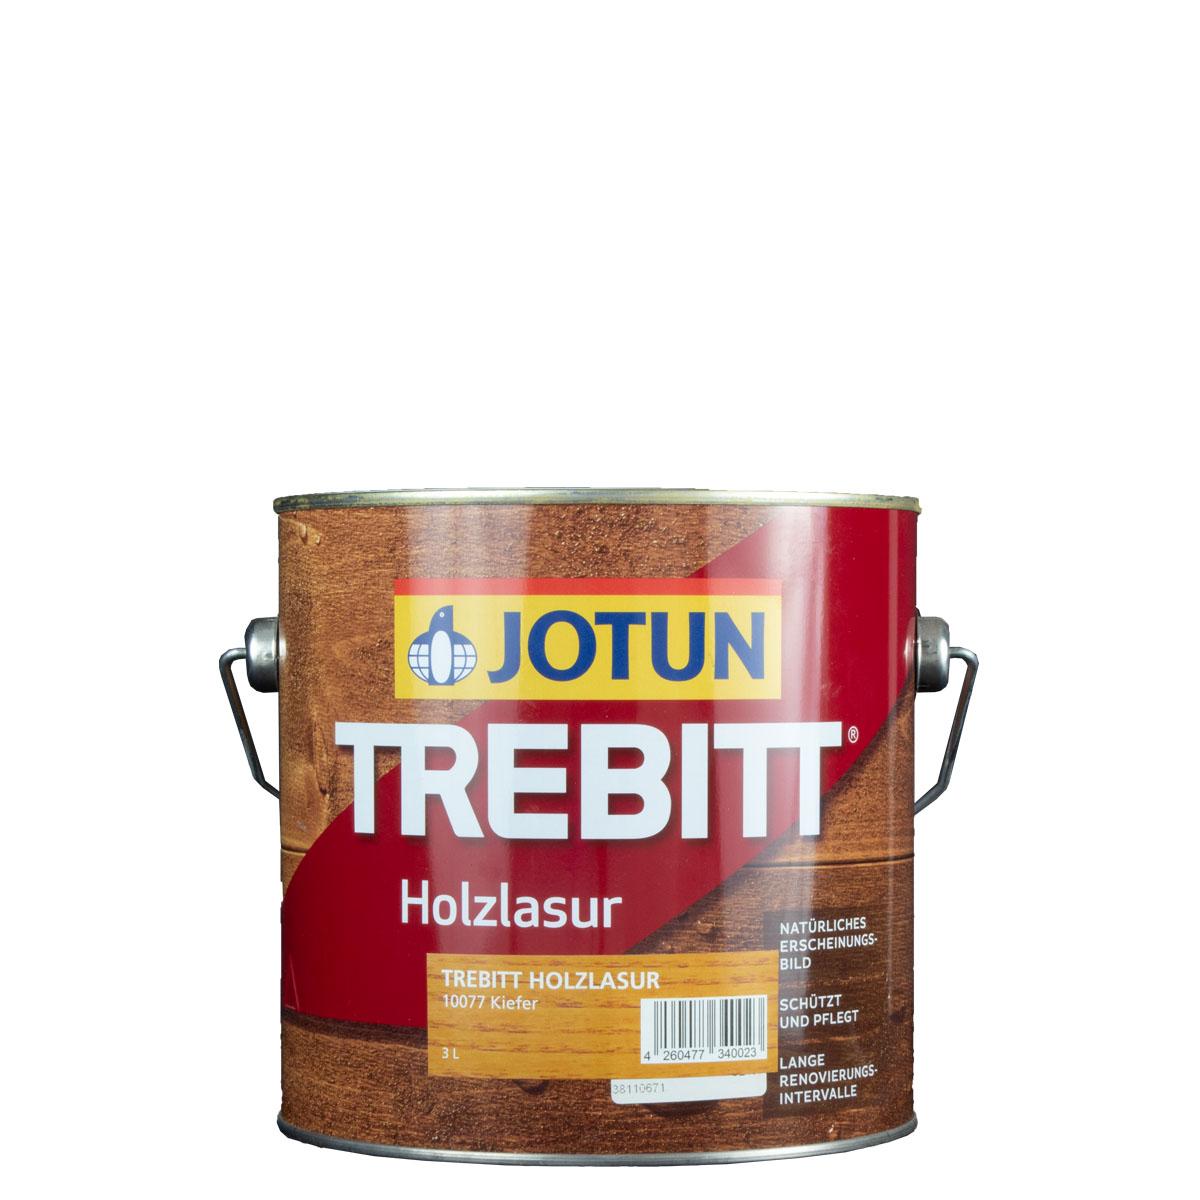 Jotun Trebitt 3L rot 686, Holzschutzlasur